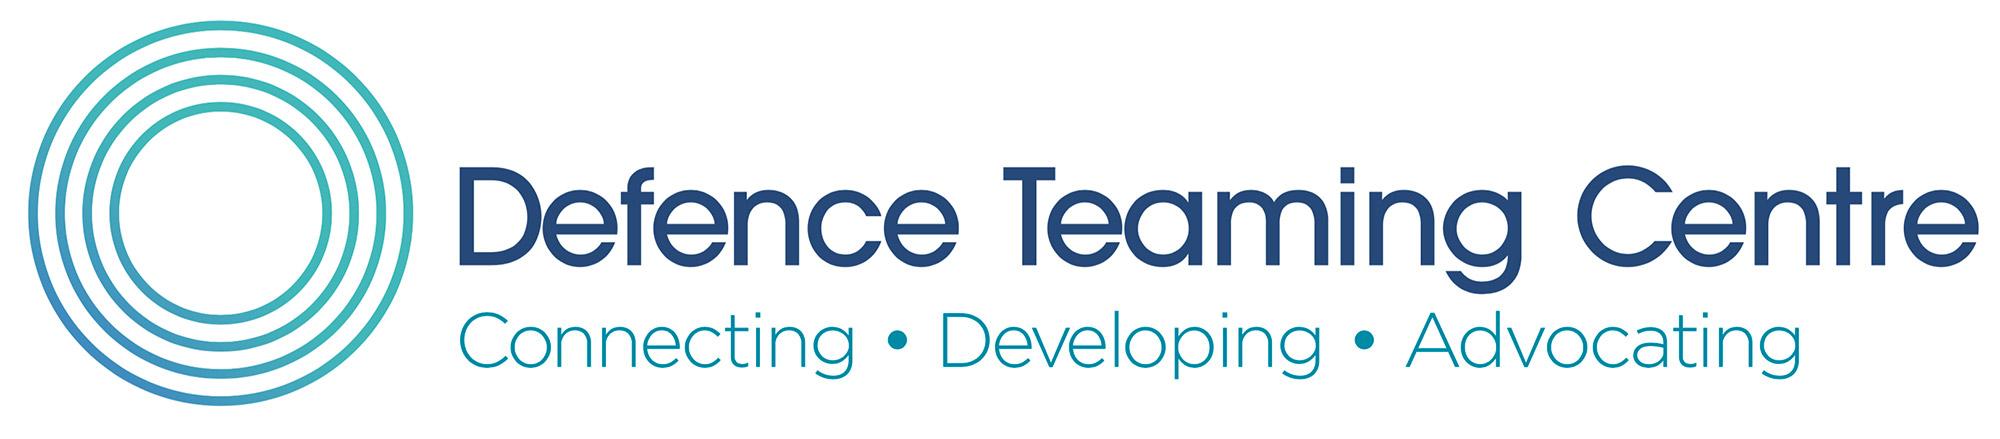 Defence Teaming Centre Logo